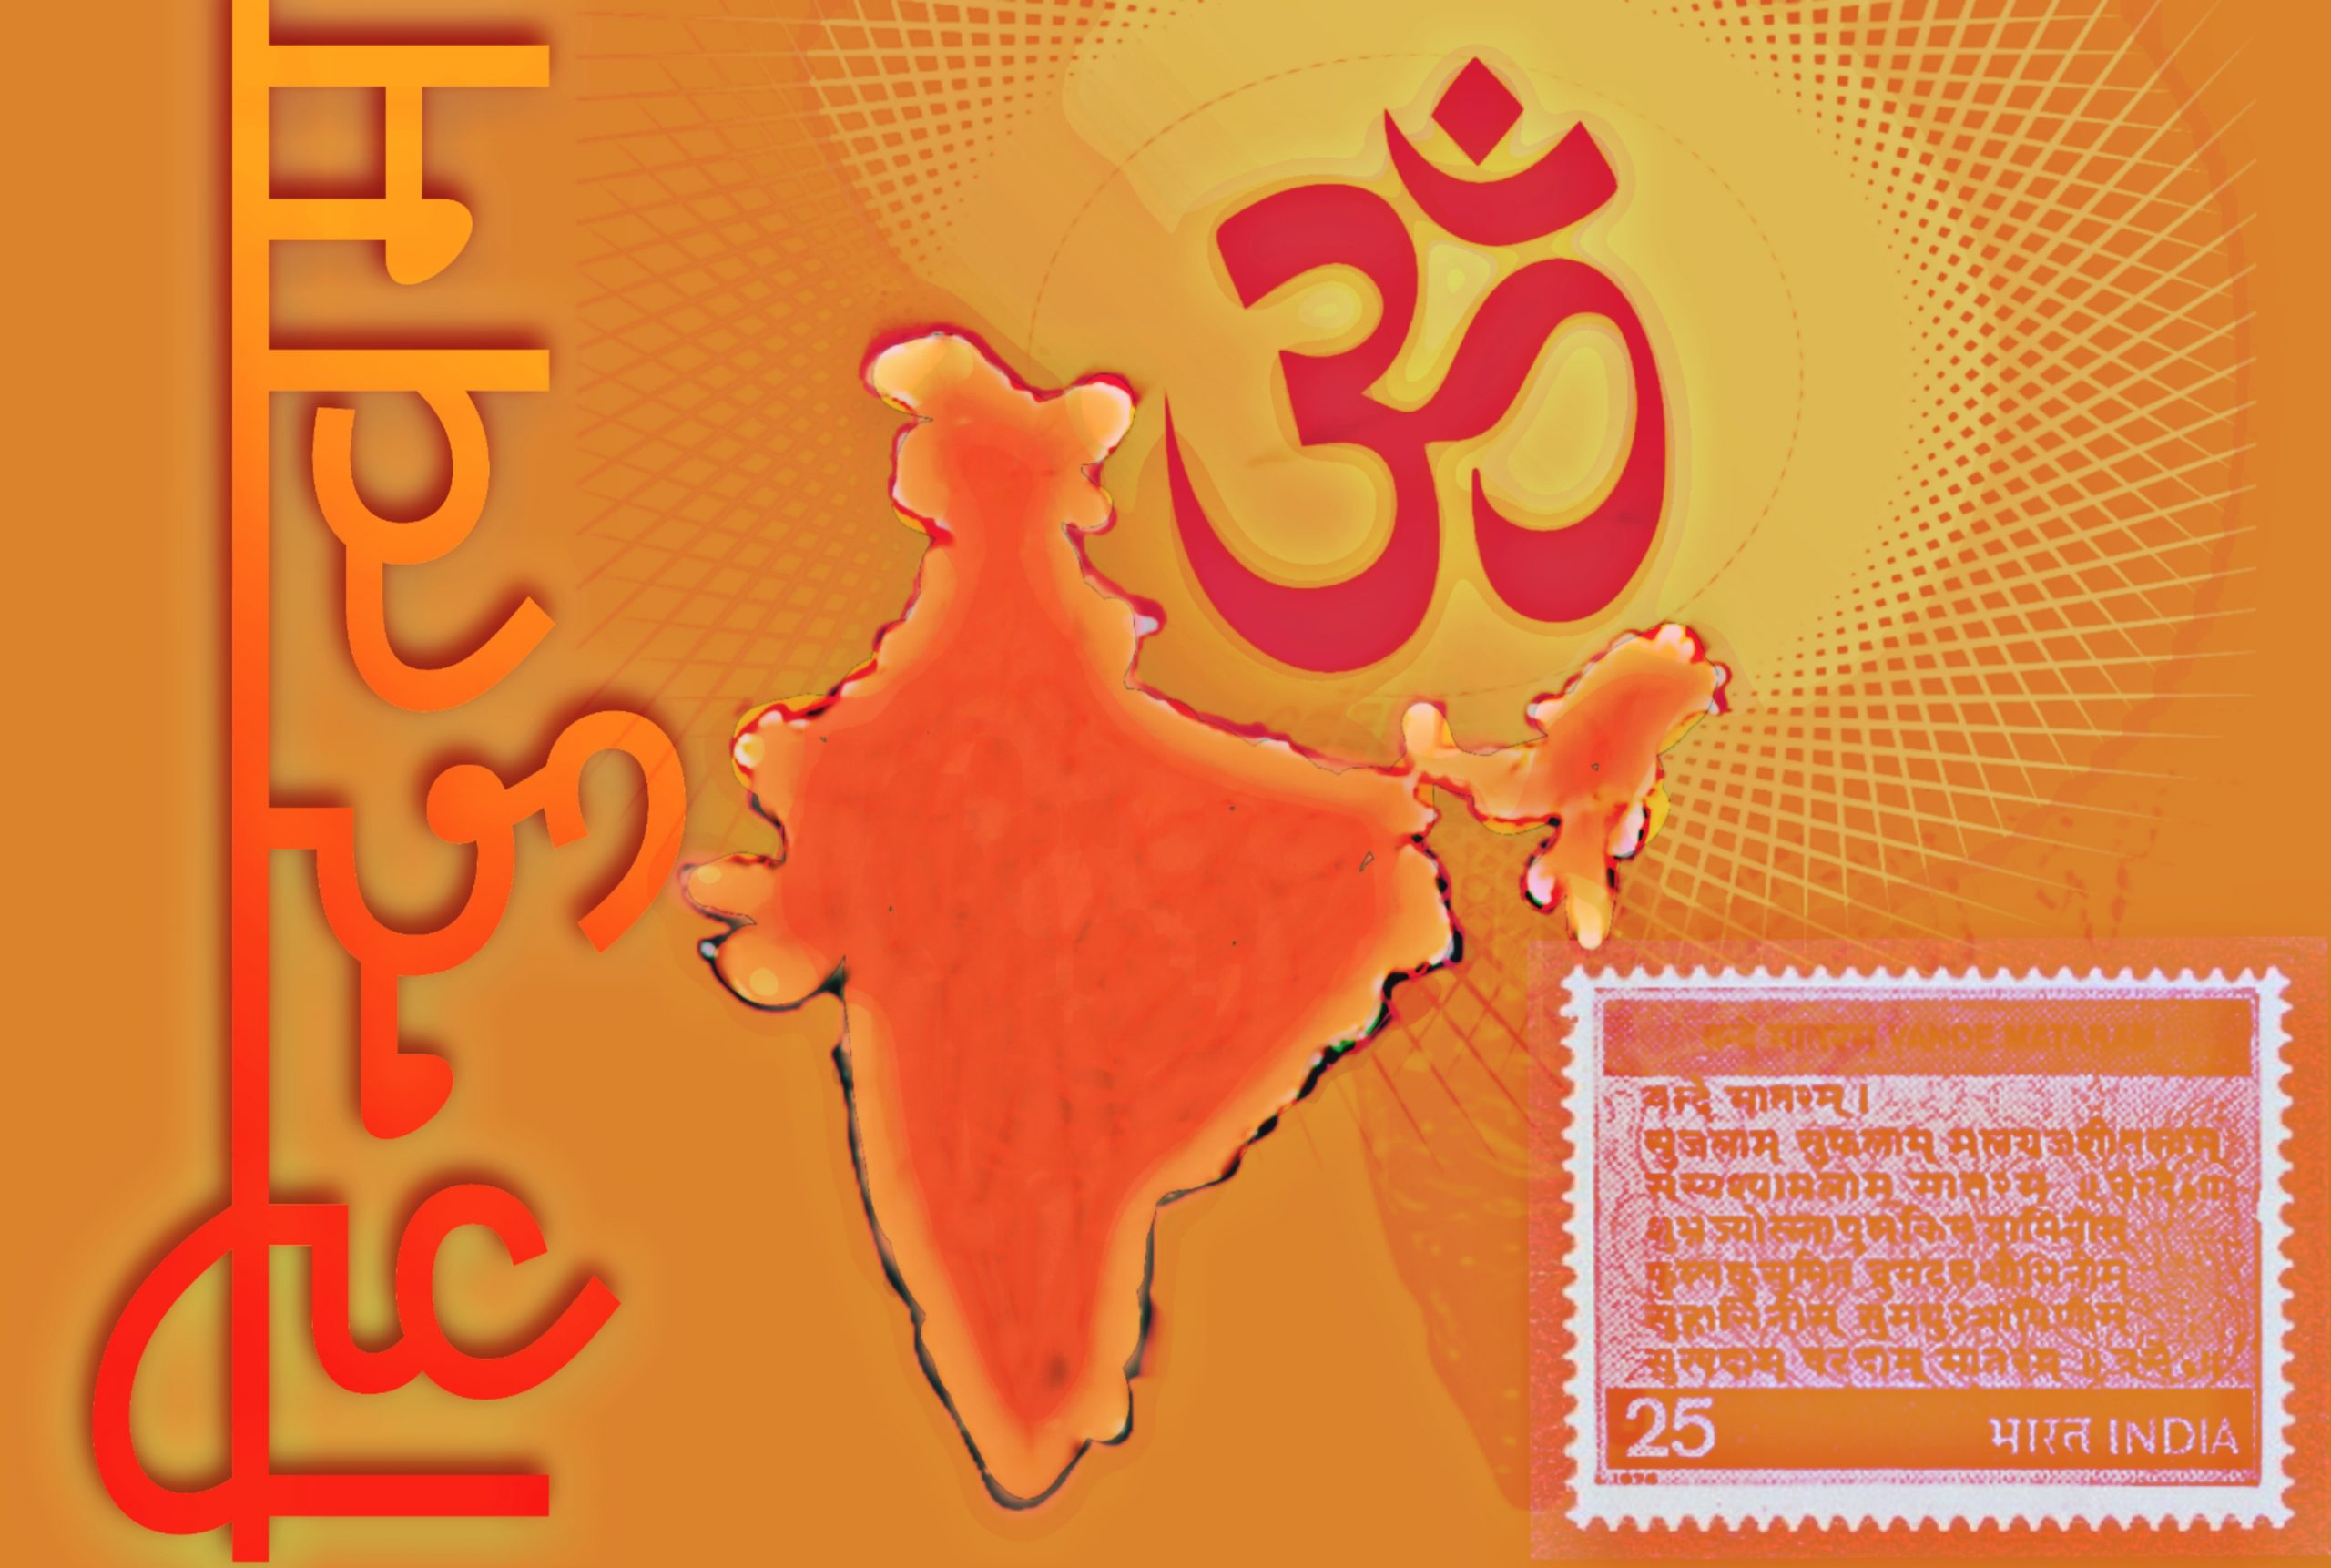 A History and Hermeneutics of the Hatred Against Hindu Rashtra